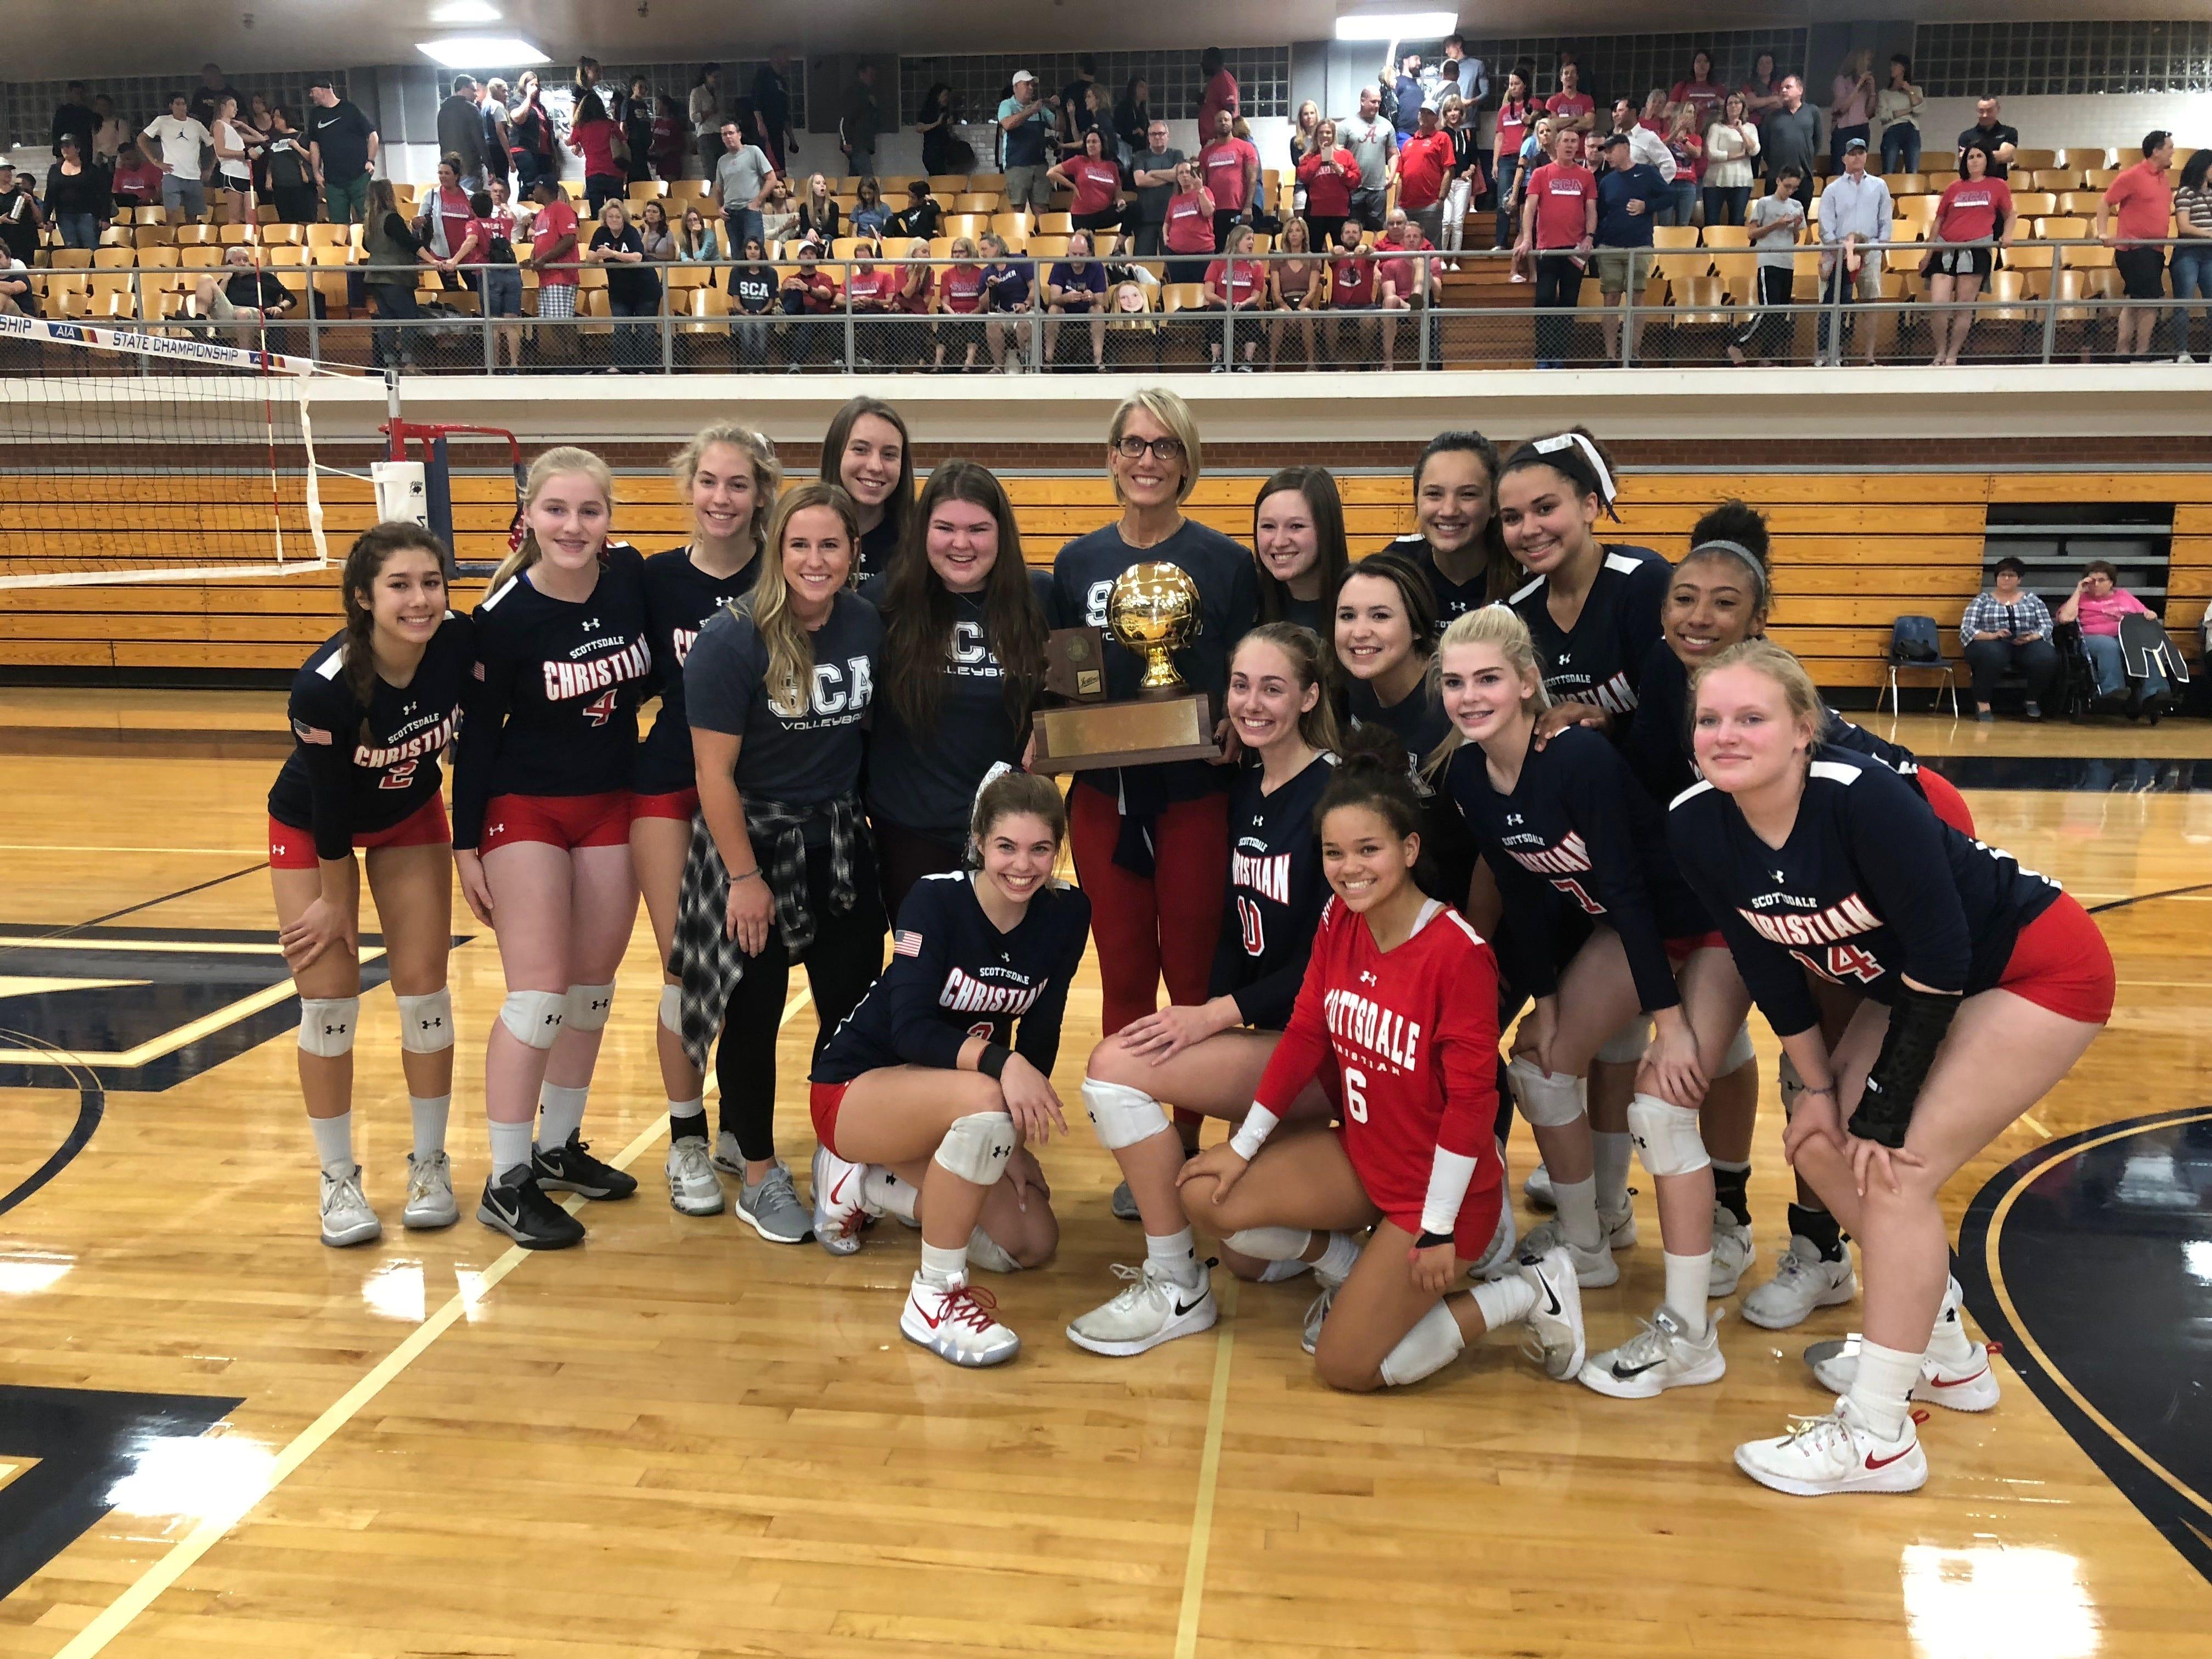 Scottsdale Christian celebrates state championship.